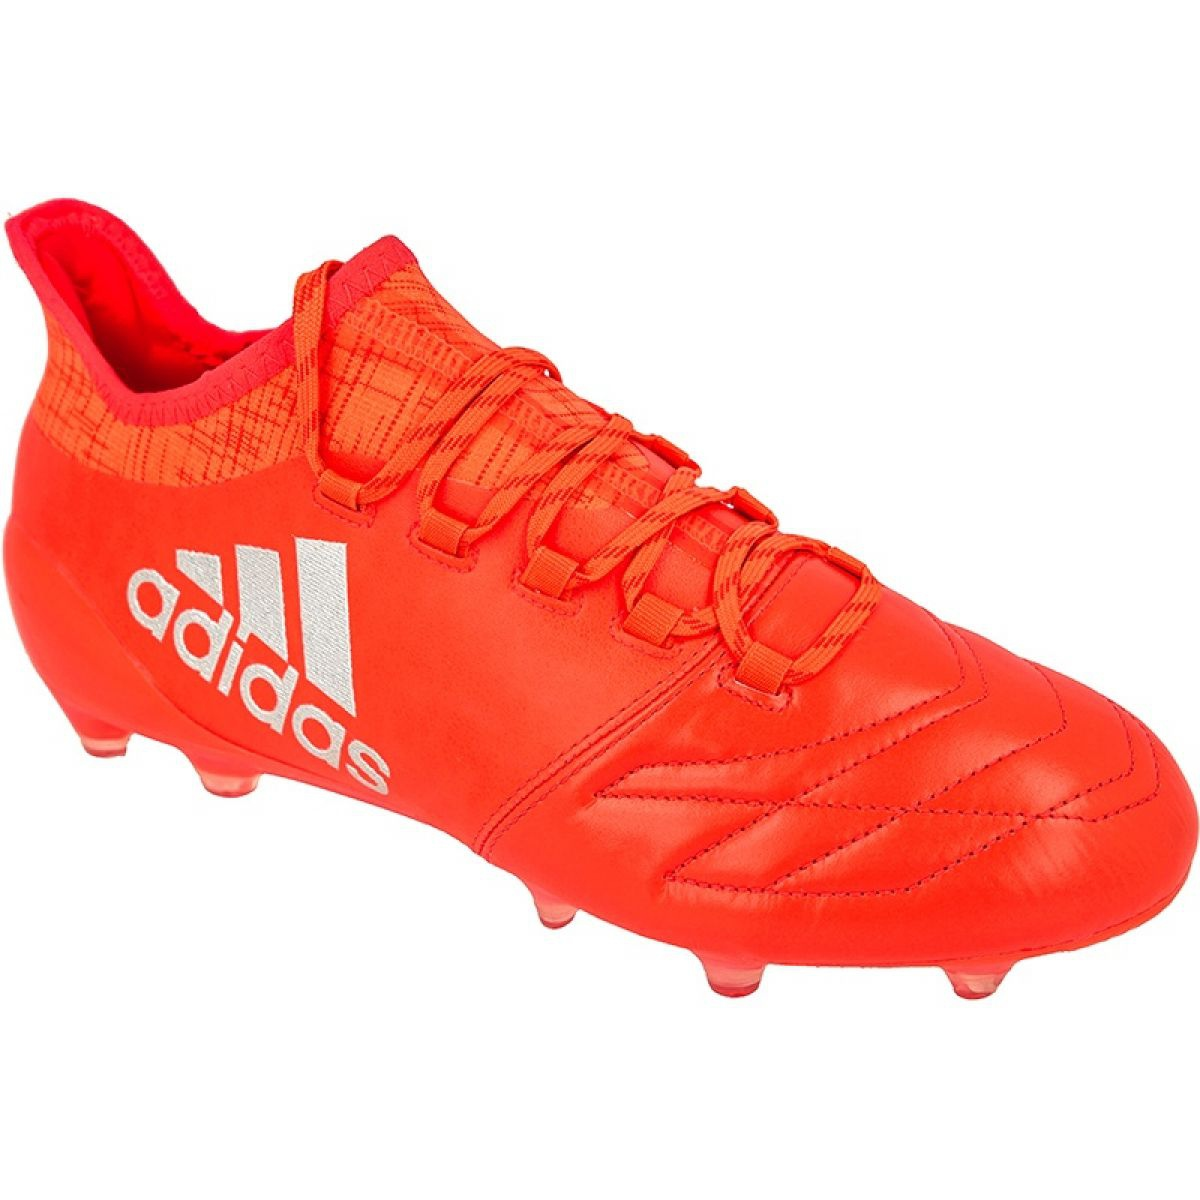 scarpe calcio adidas x16